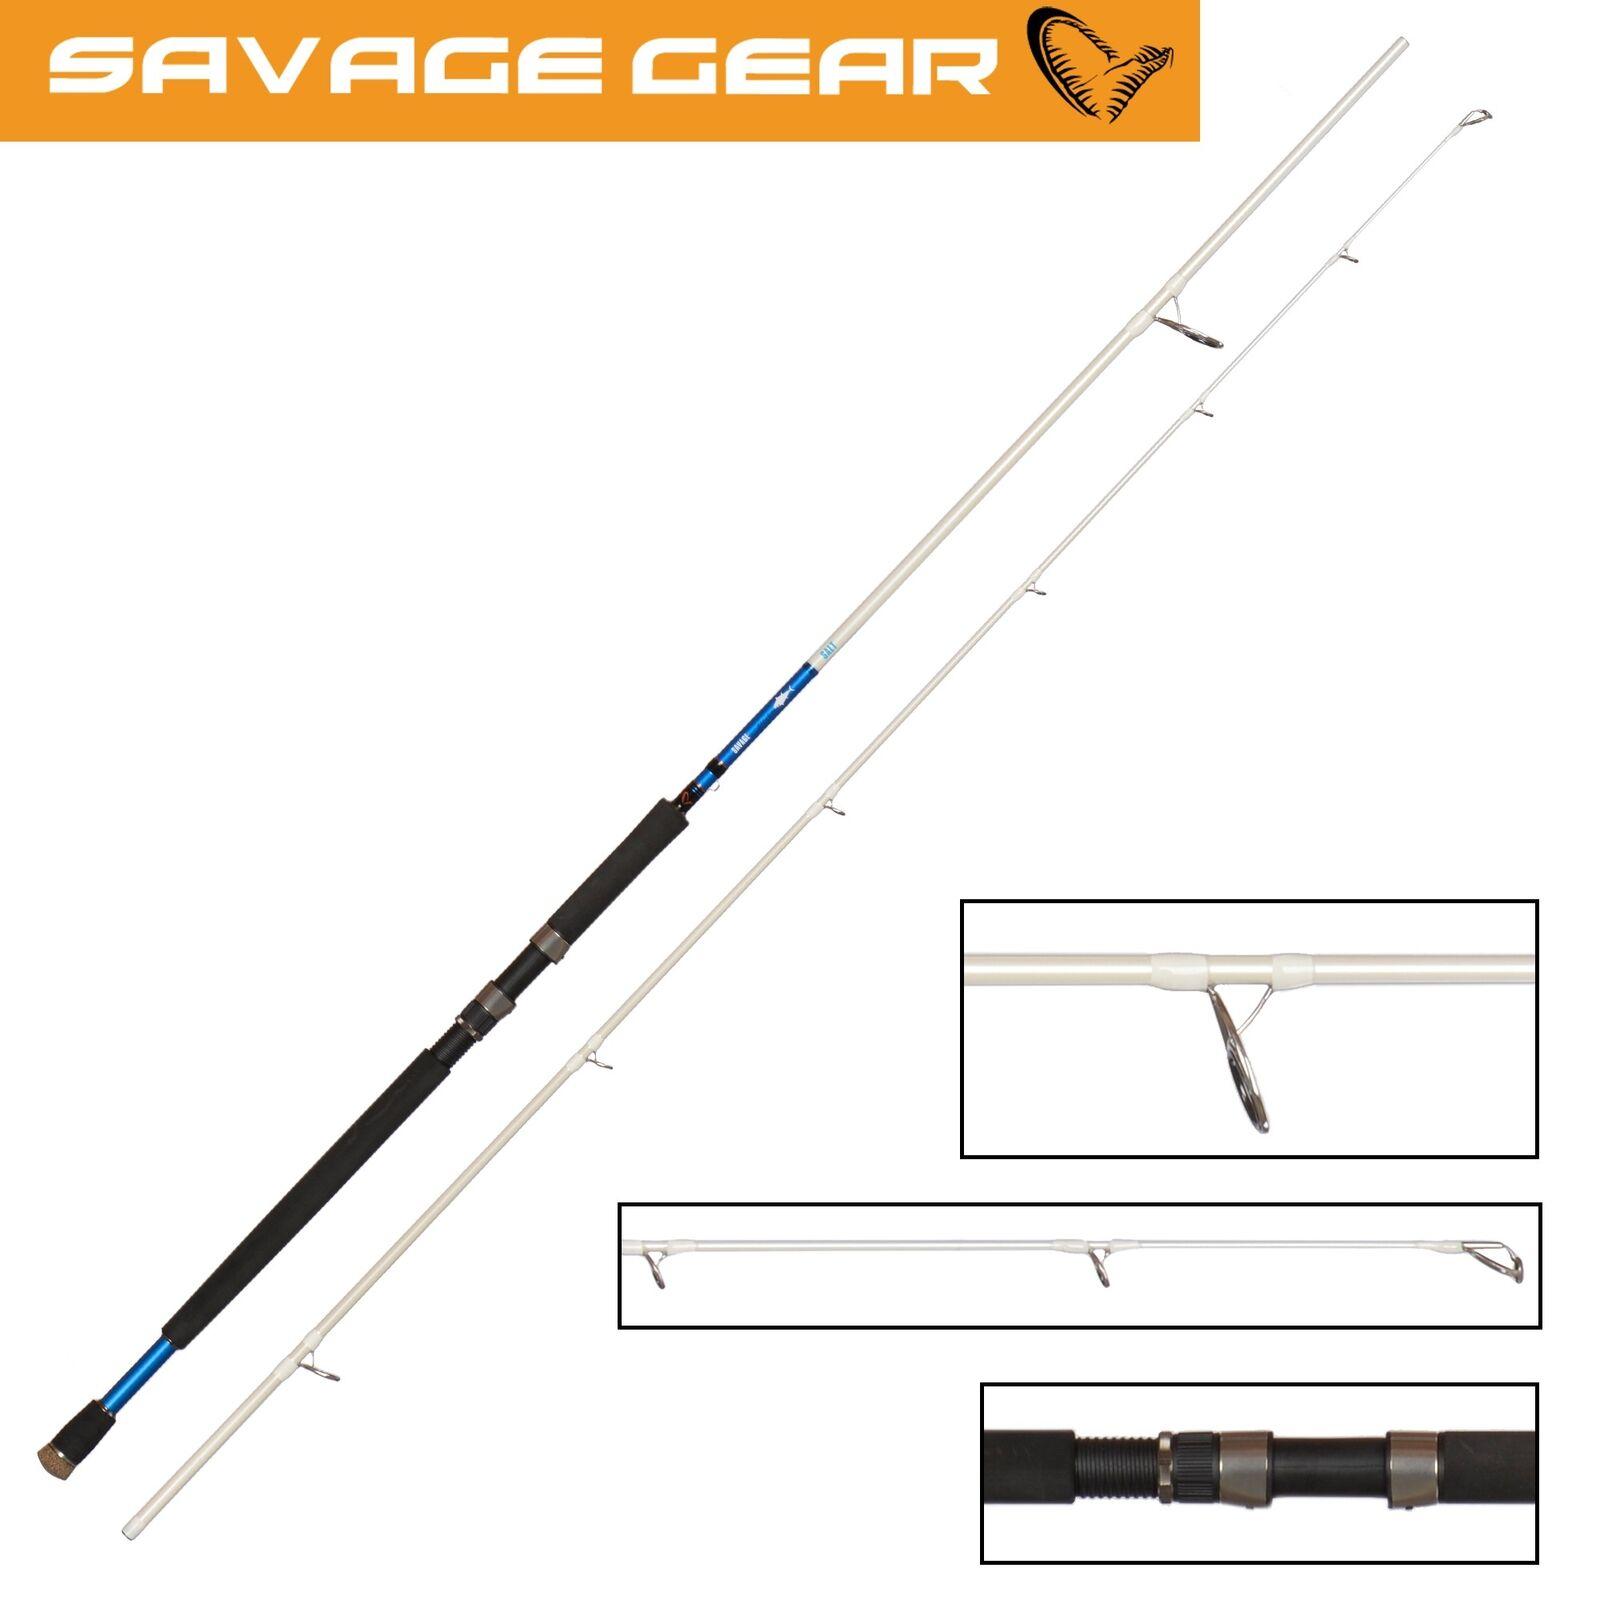 Savage Gear Gear Gear Salt 1DFR Shore Jigging 274cm 60-120g - Meeresrute, Dorschrute, Rute 3533e5